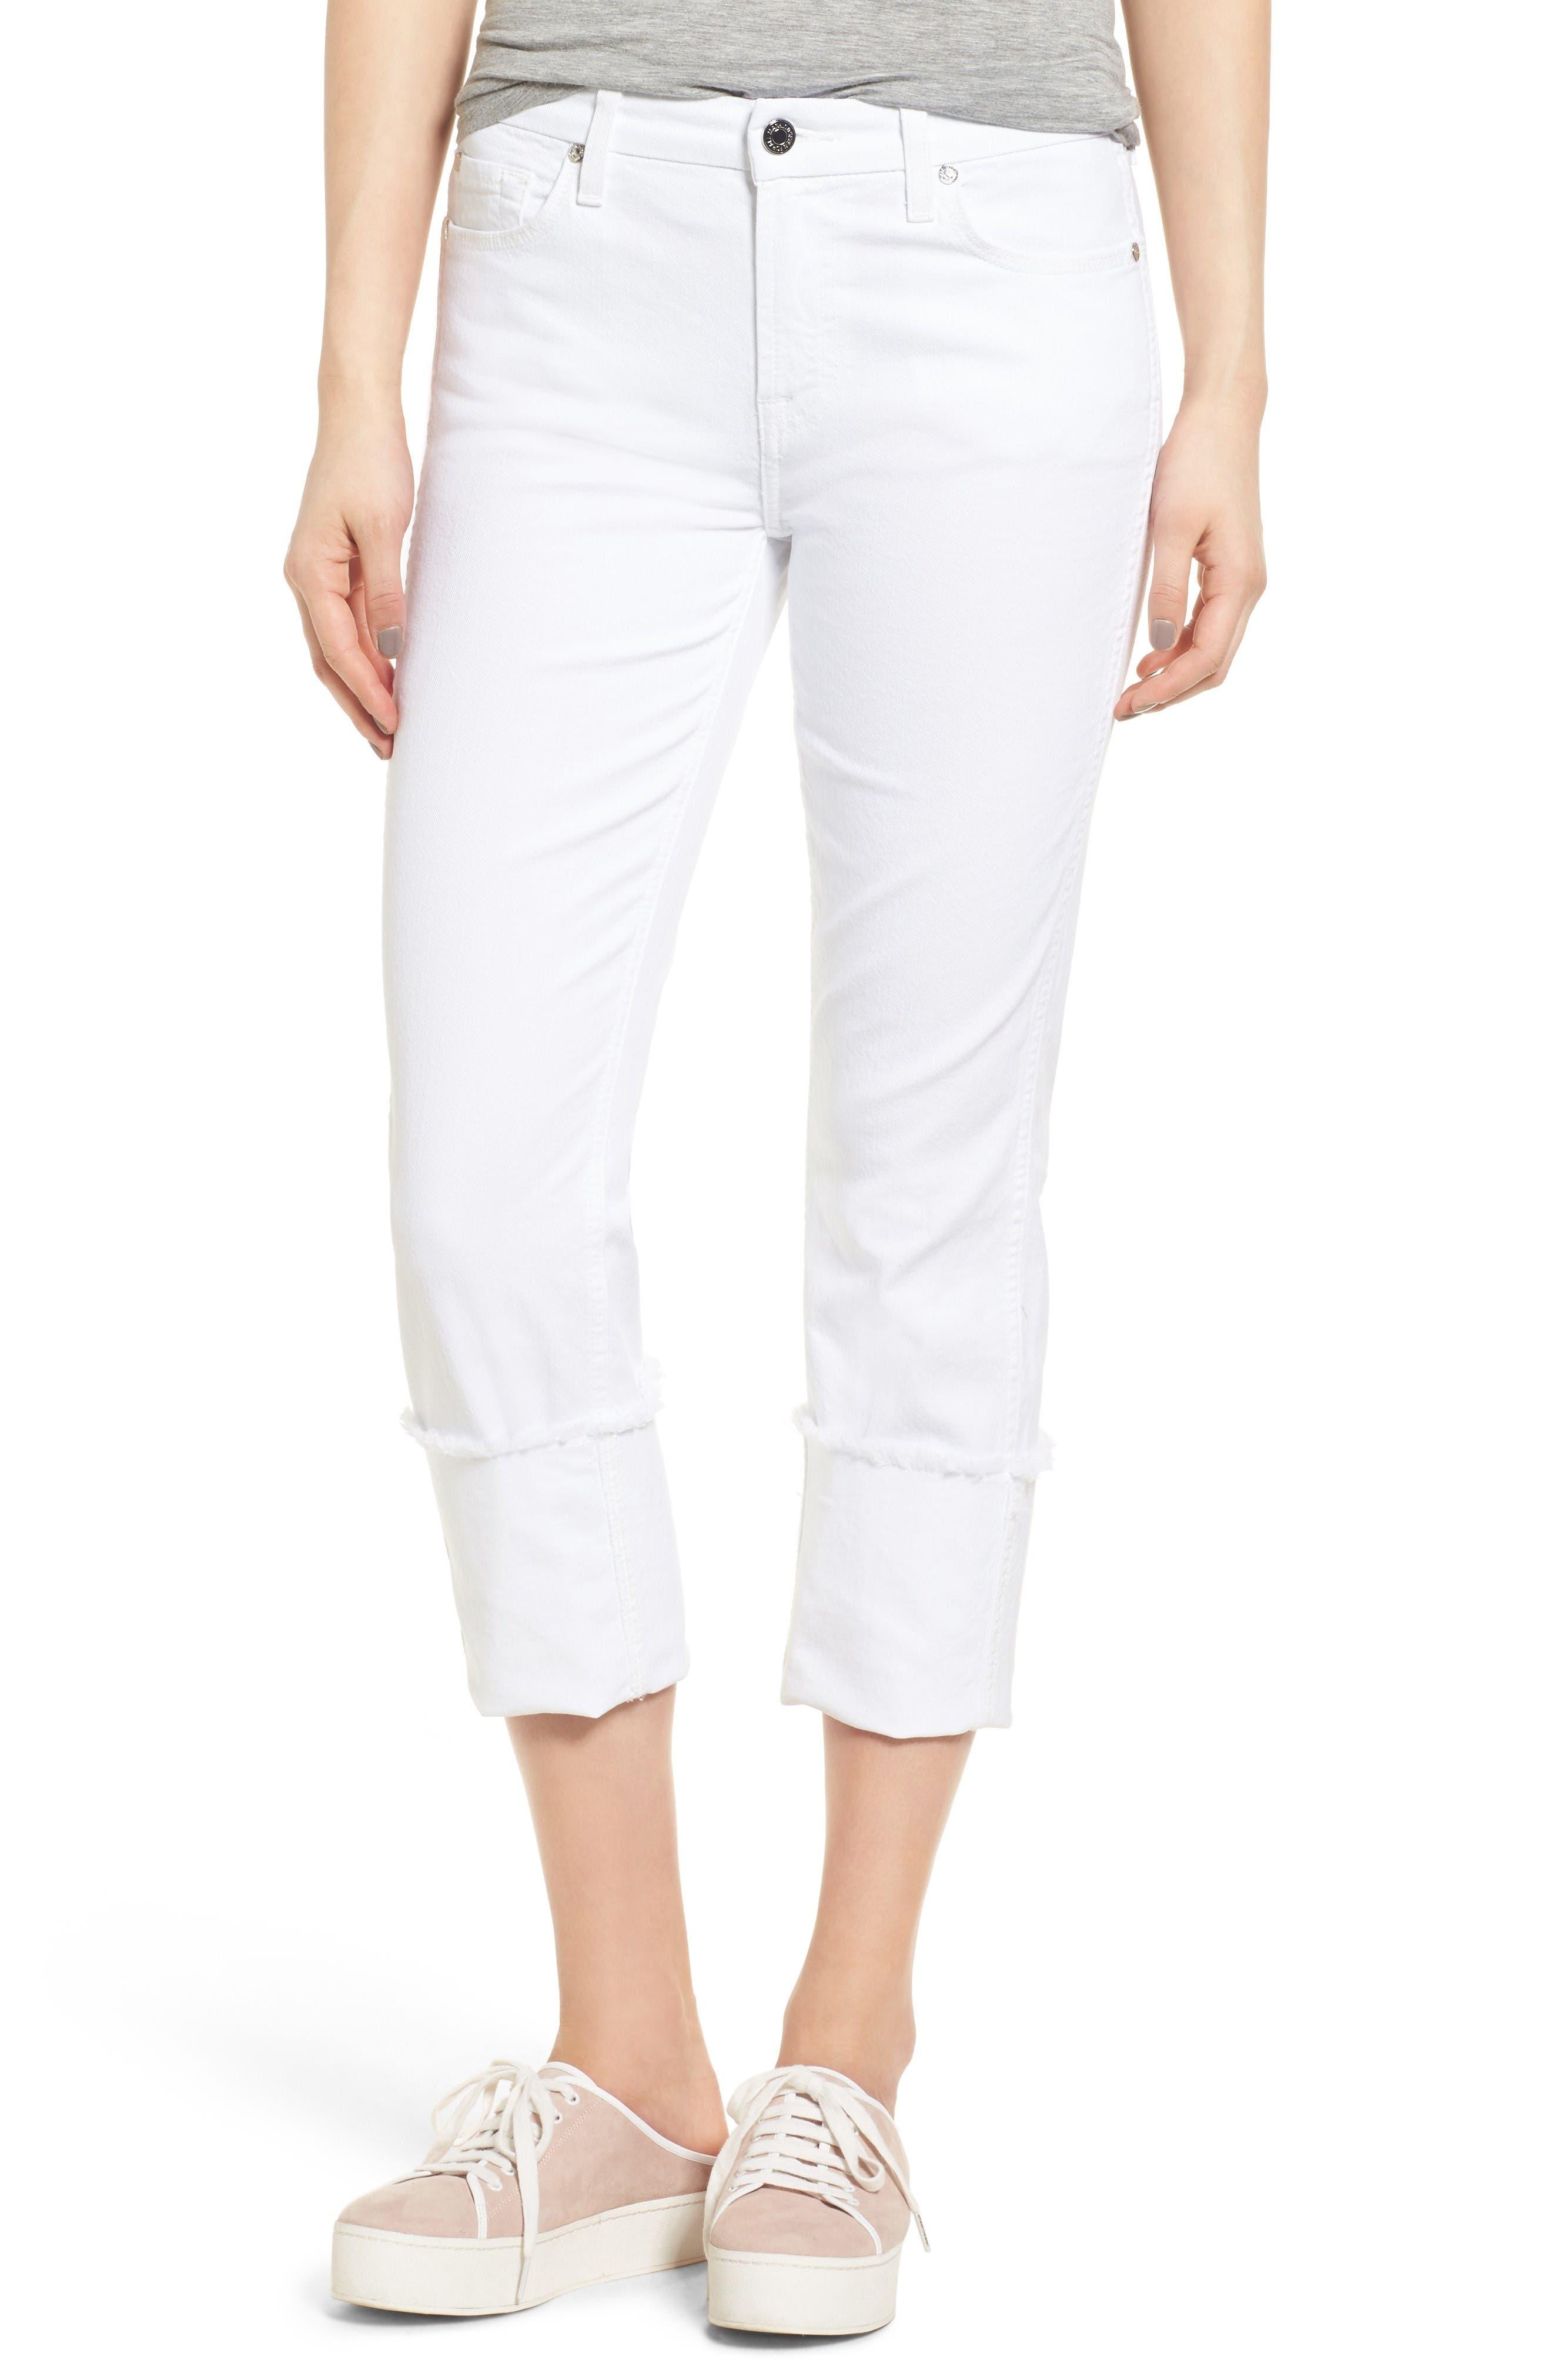 Main Image - 7 For All Mankind® Fashion Boyfriend Raw Cuffed Jeans (White Fashion)